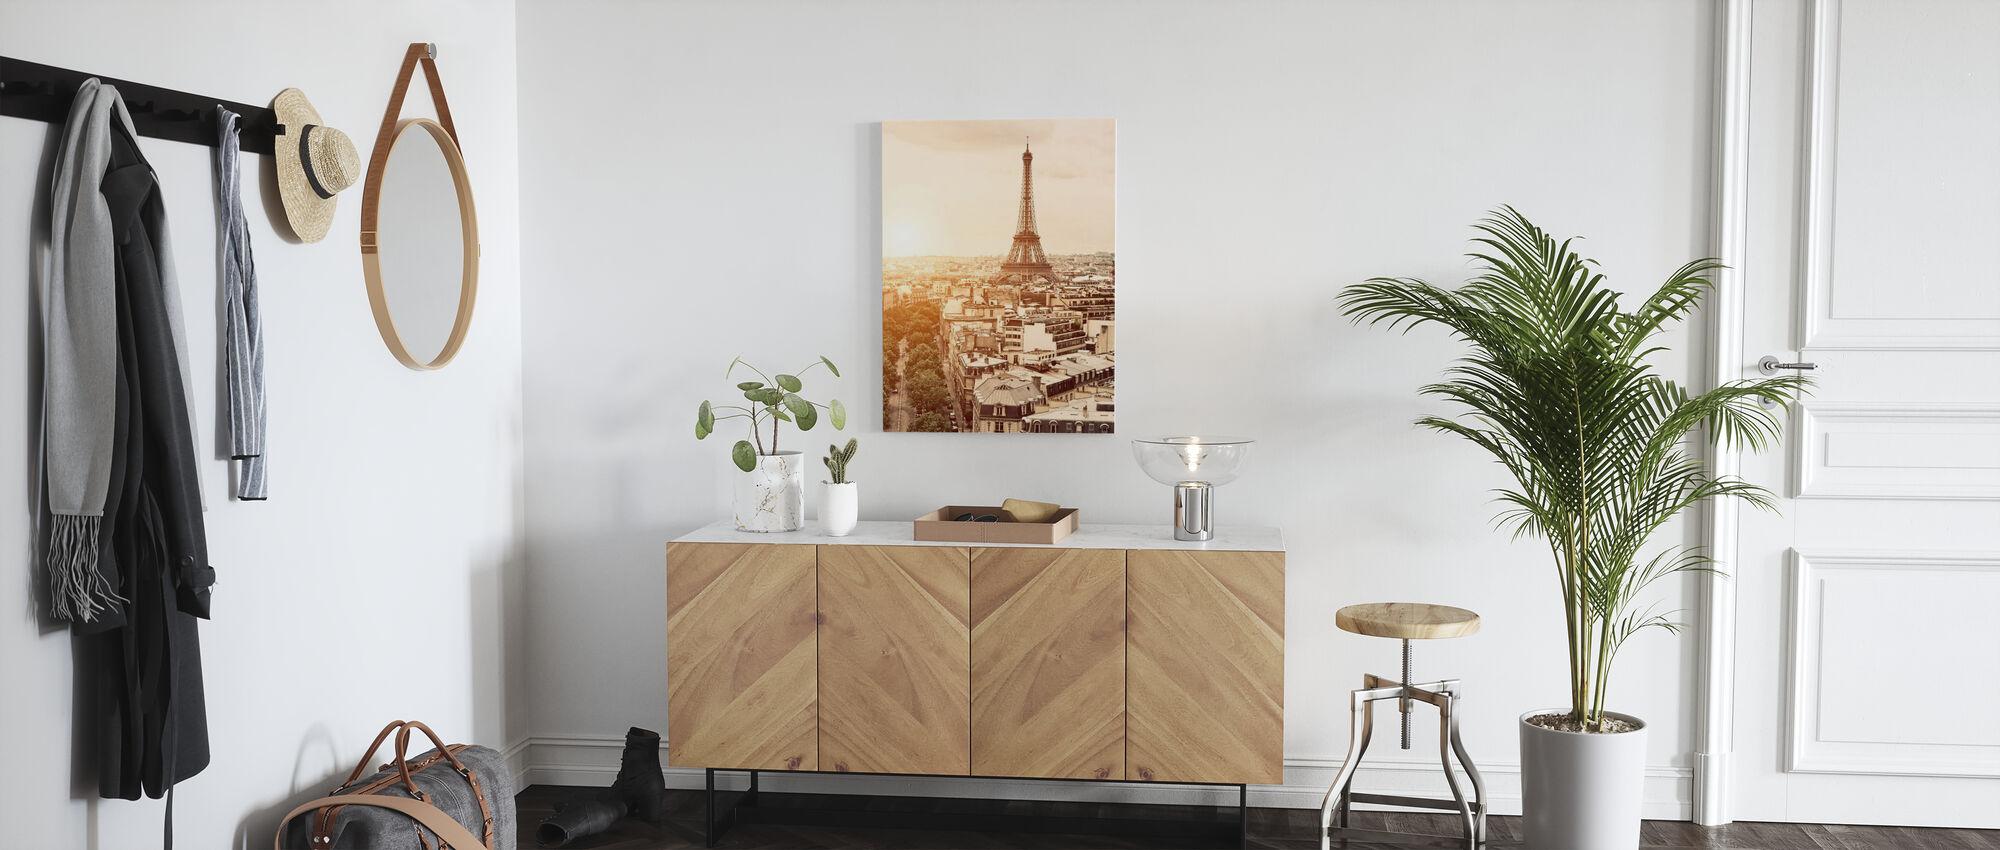 Paris - Eiffel Tower - Canvas print - Hallway